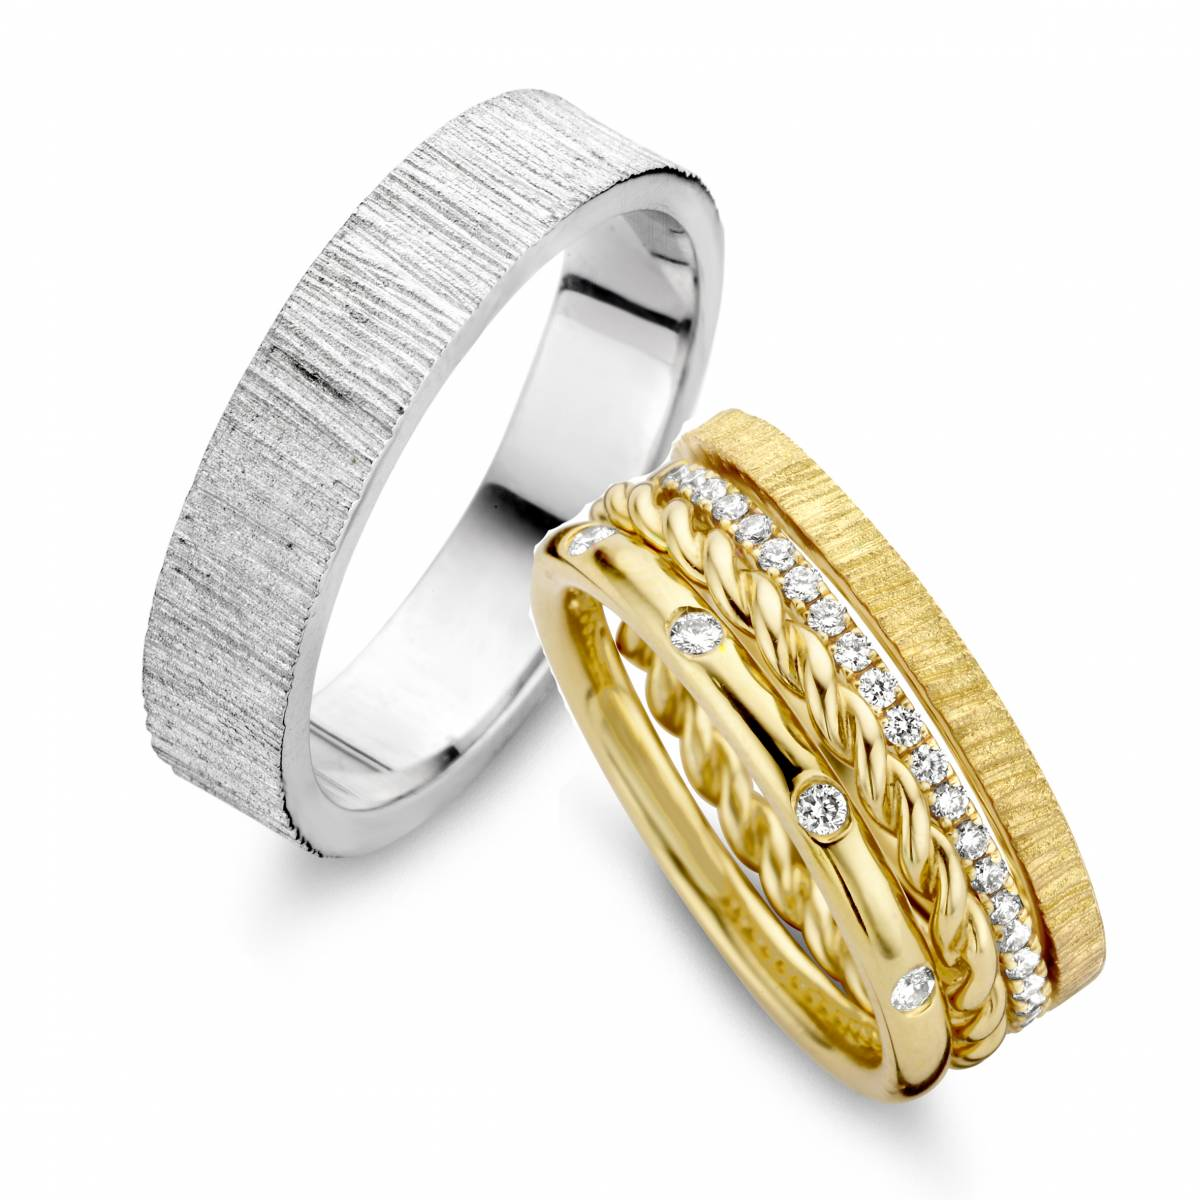 Juwelier Vandromme - Juwelen - Trouwring - Verlovingsring – House of Weddings - 16